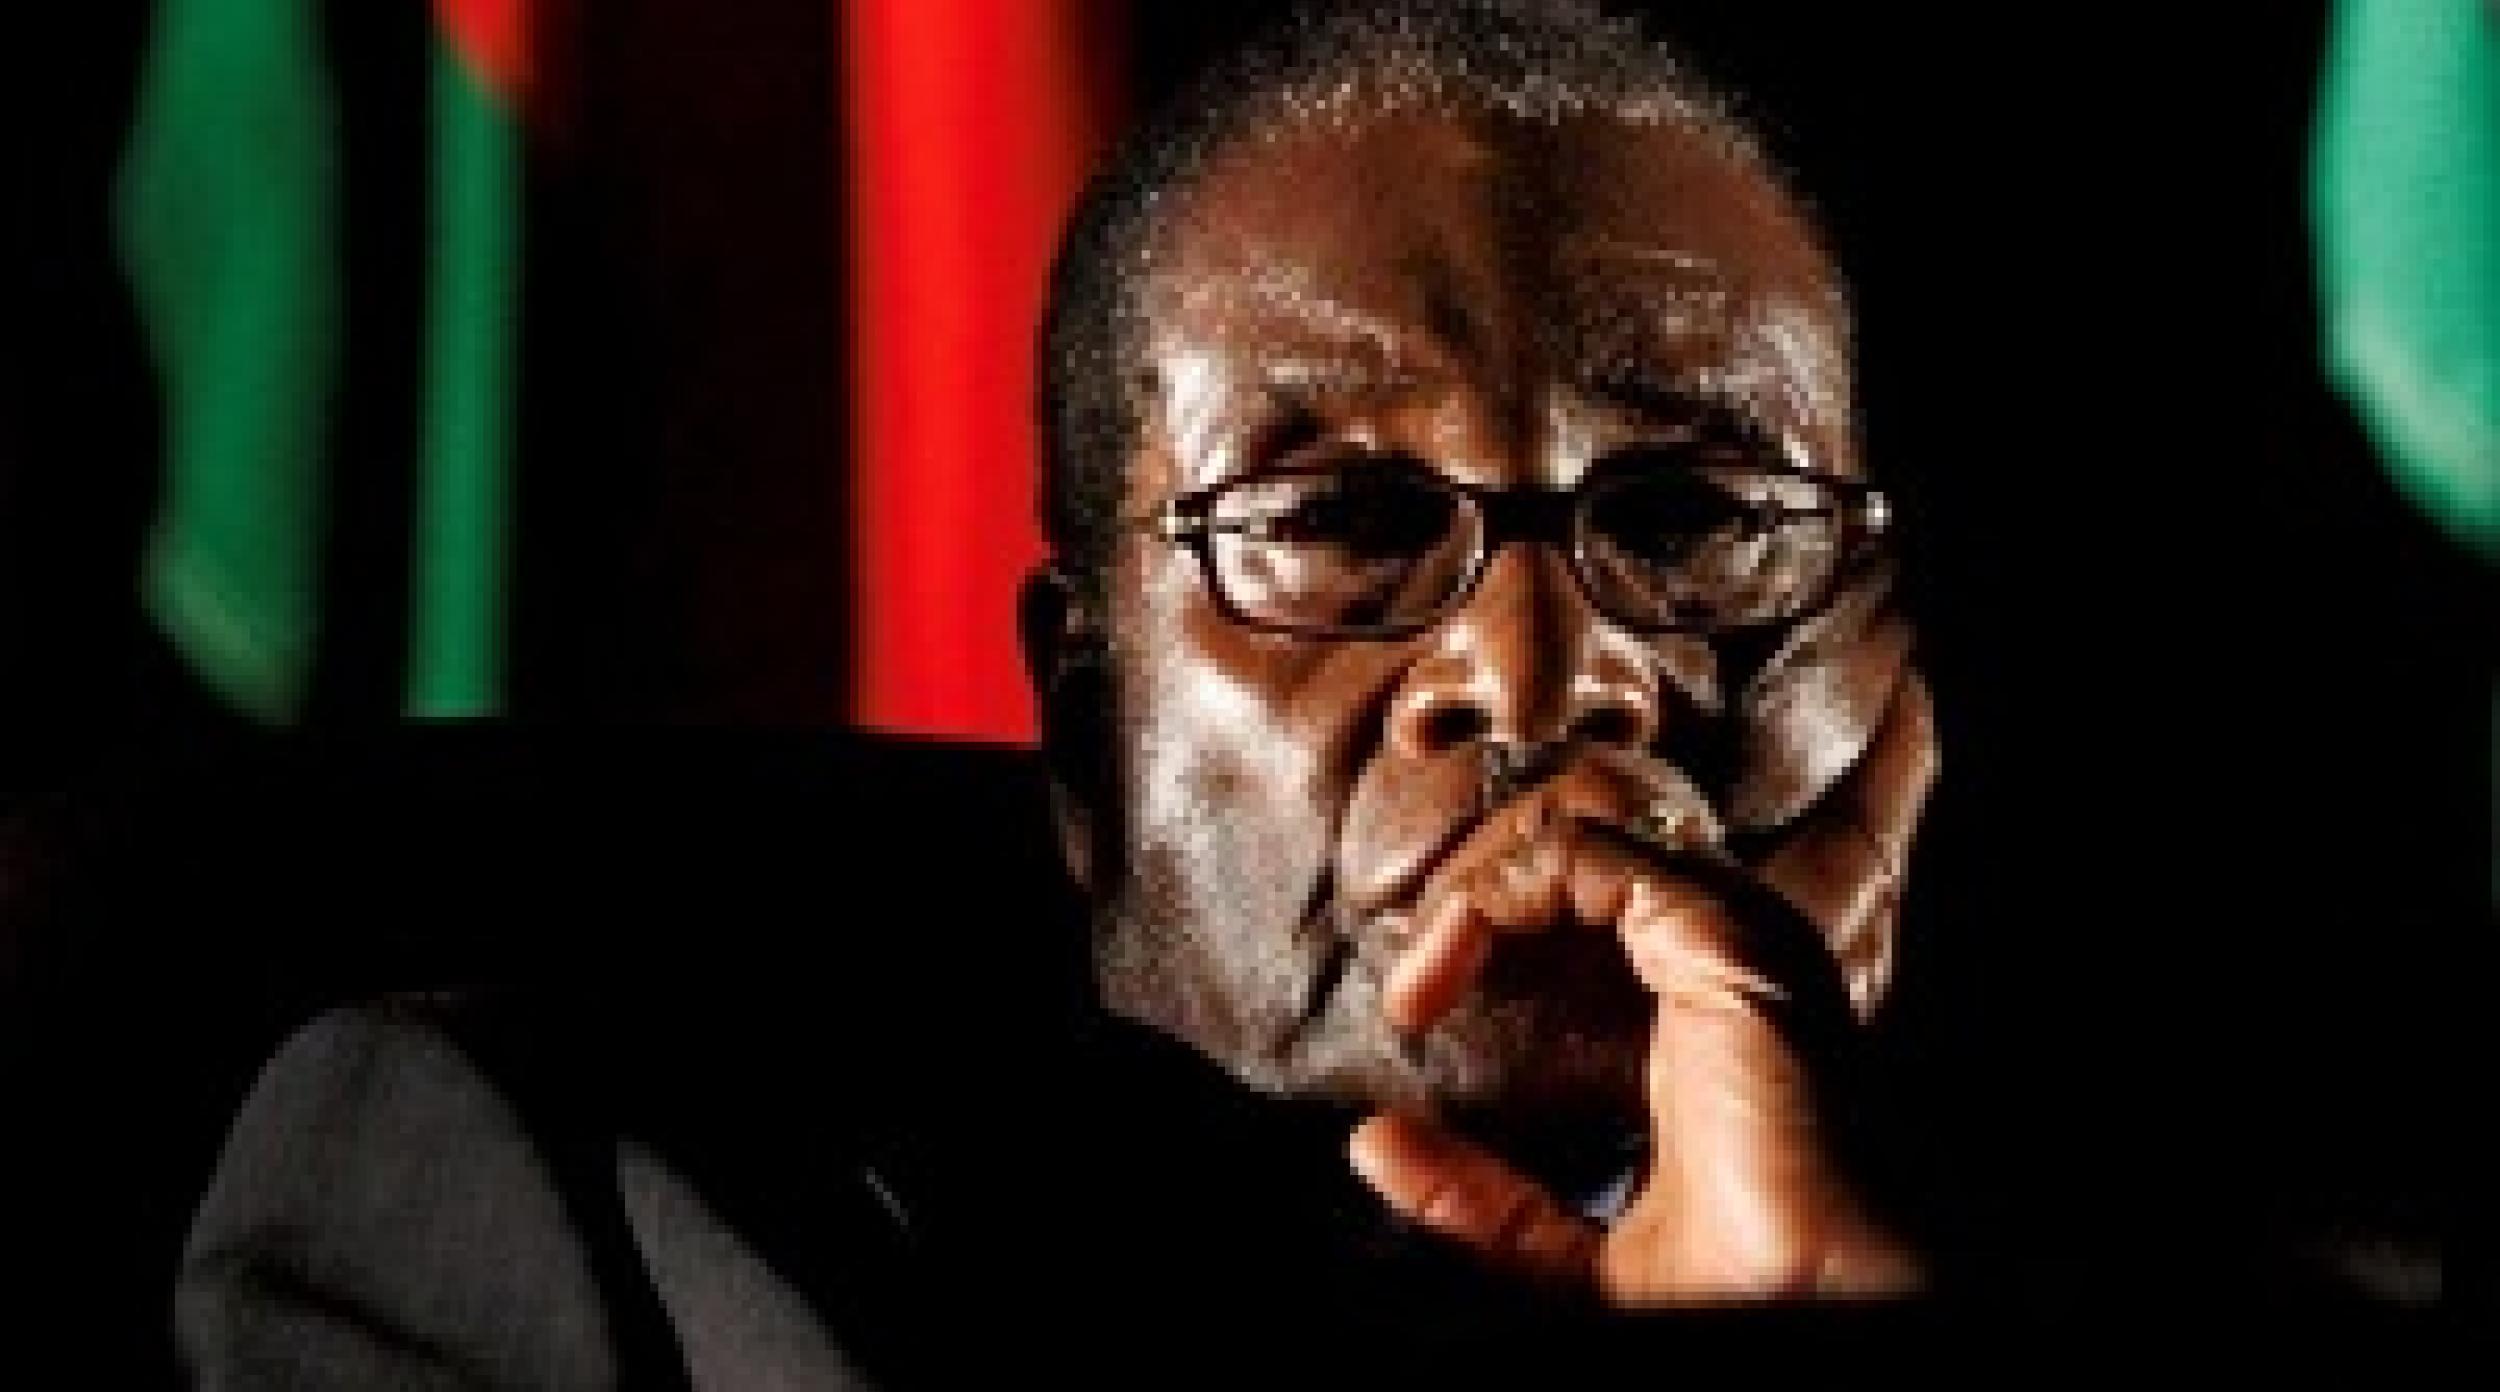 NEWS : ሮበርት ሙጋቤ የጠሩት የካቢኔ ስብሰባ አብዛኞቹ ሚኒስትሮች ባለመገኘታቸው ሳይካሄድ ቀረ - Most Ministers Boycott Cabinet Meeting Called by Mugabe